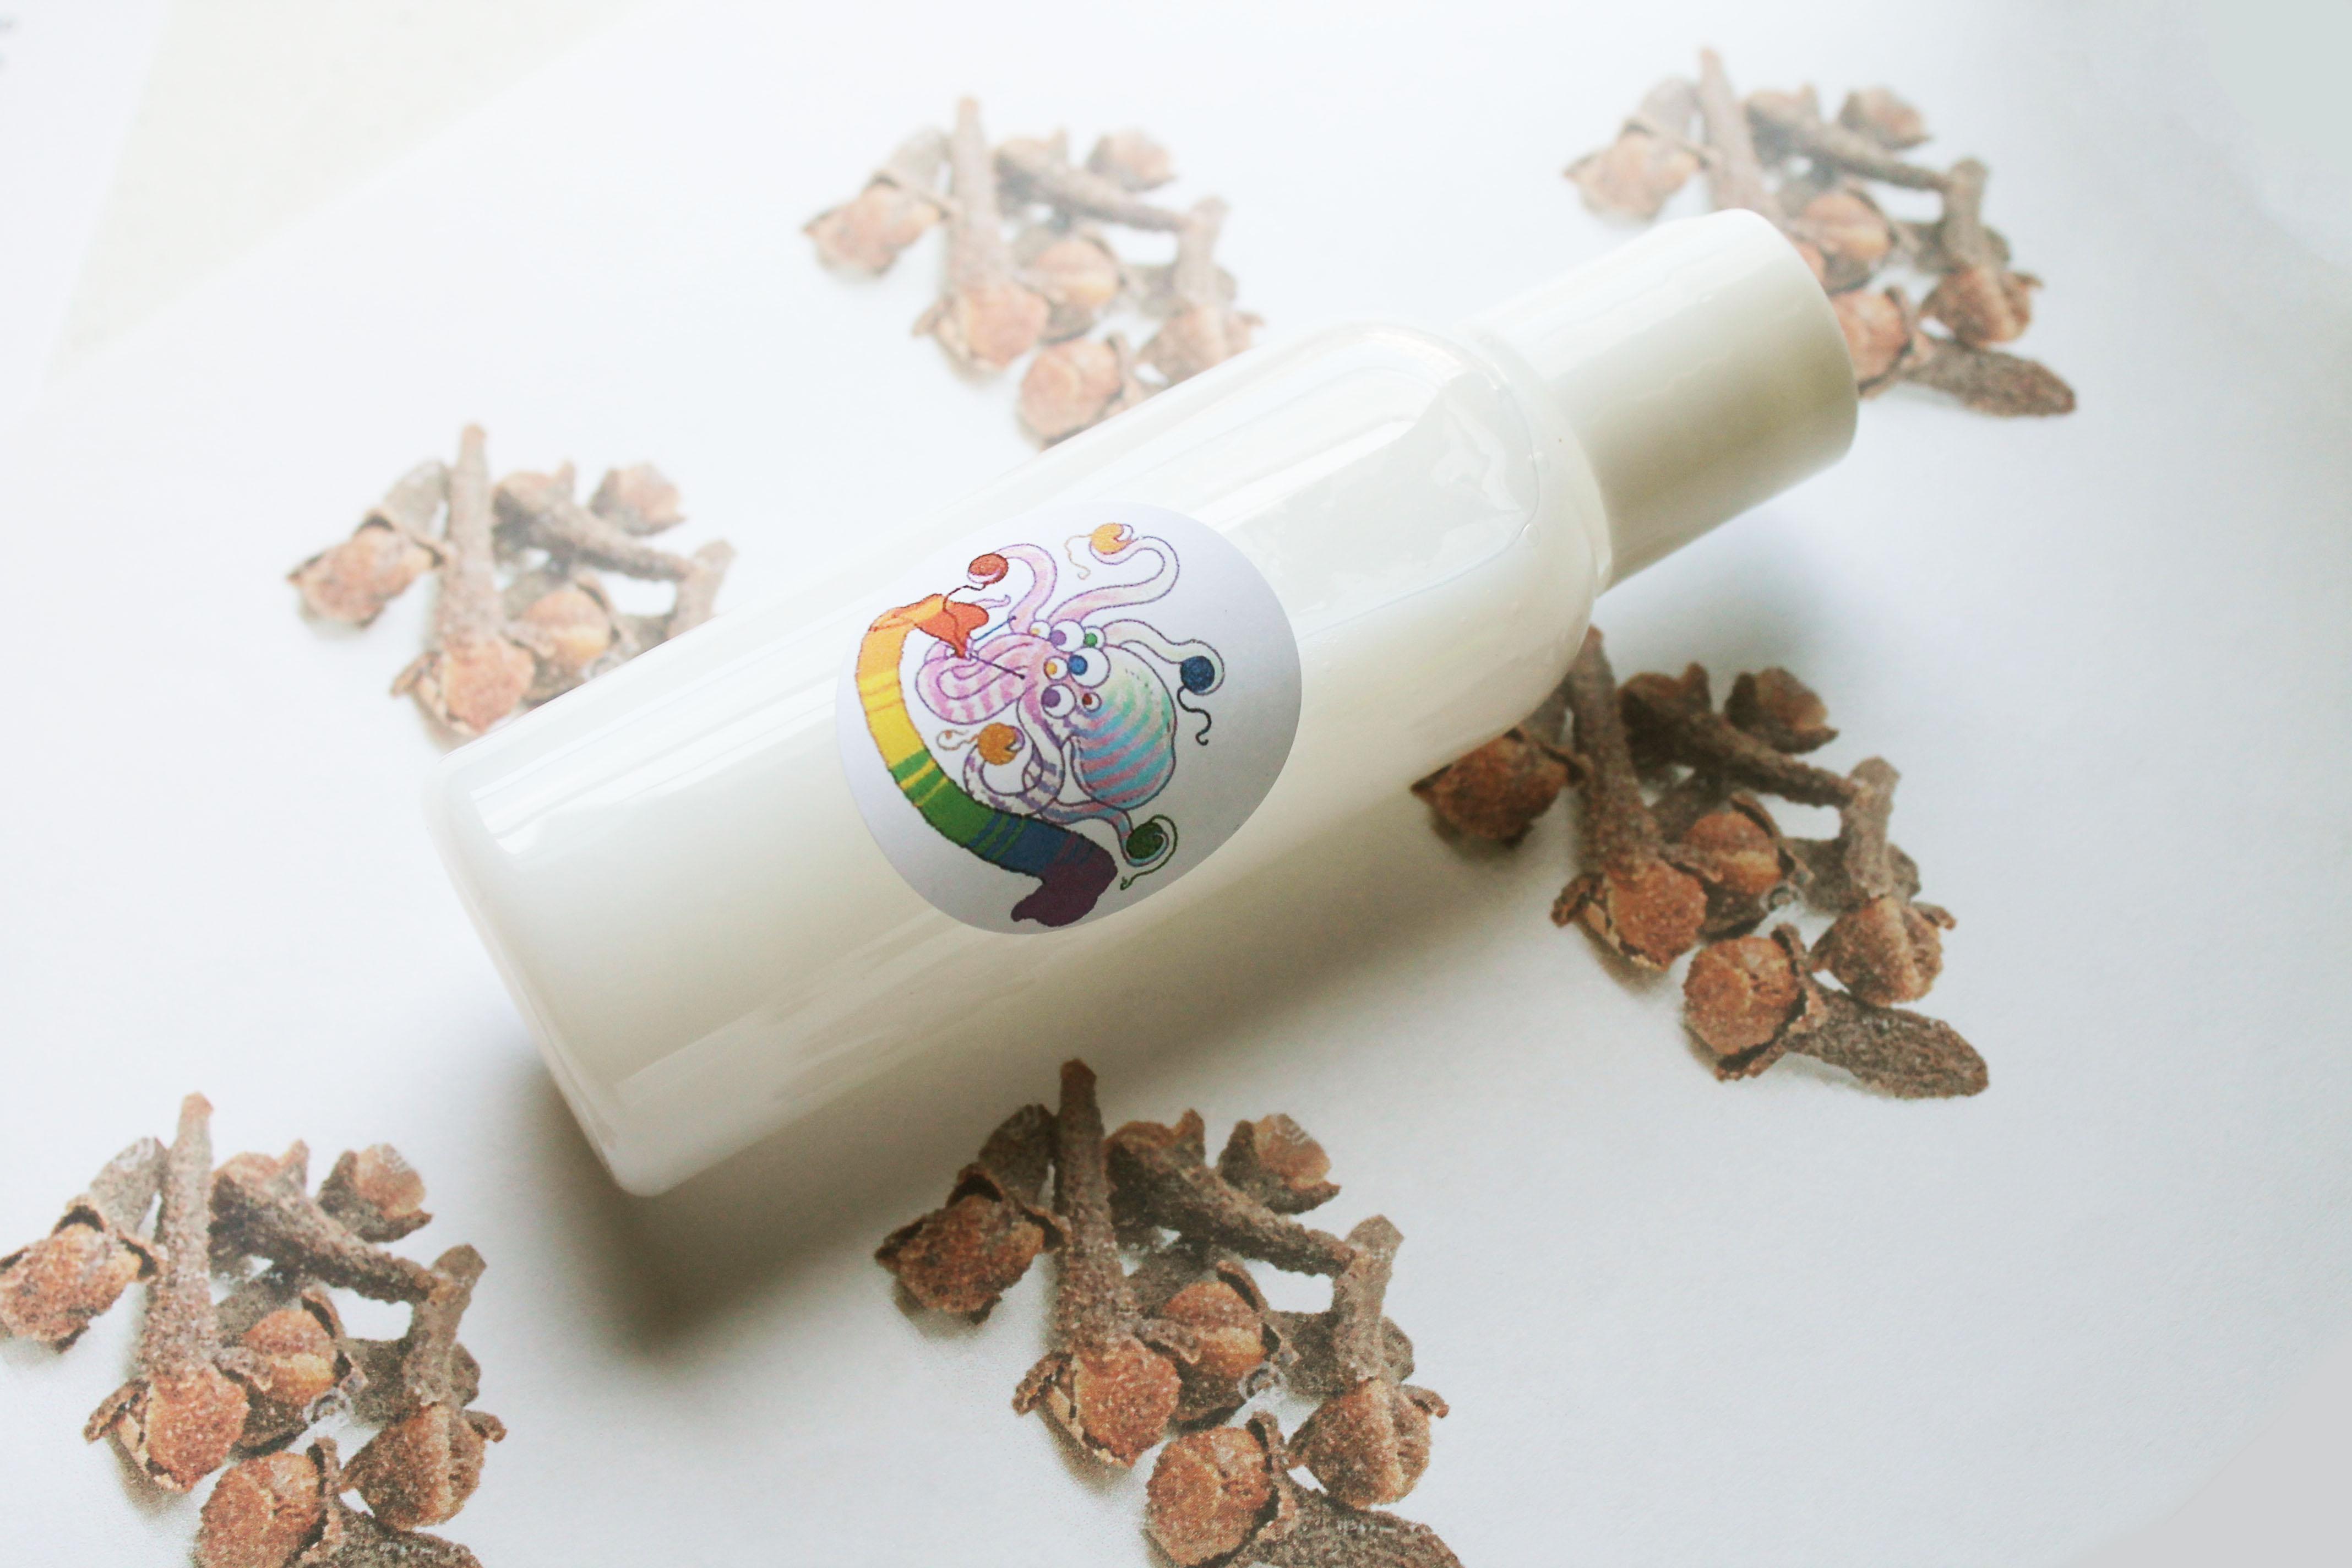 clove lotion.JPG